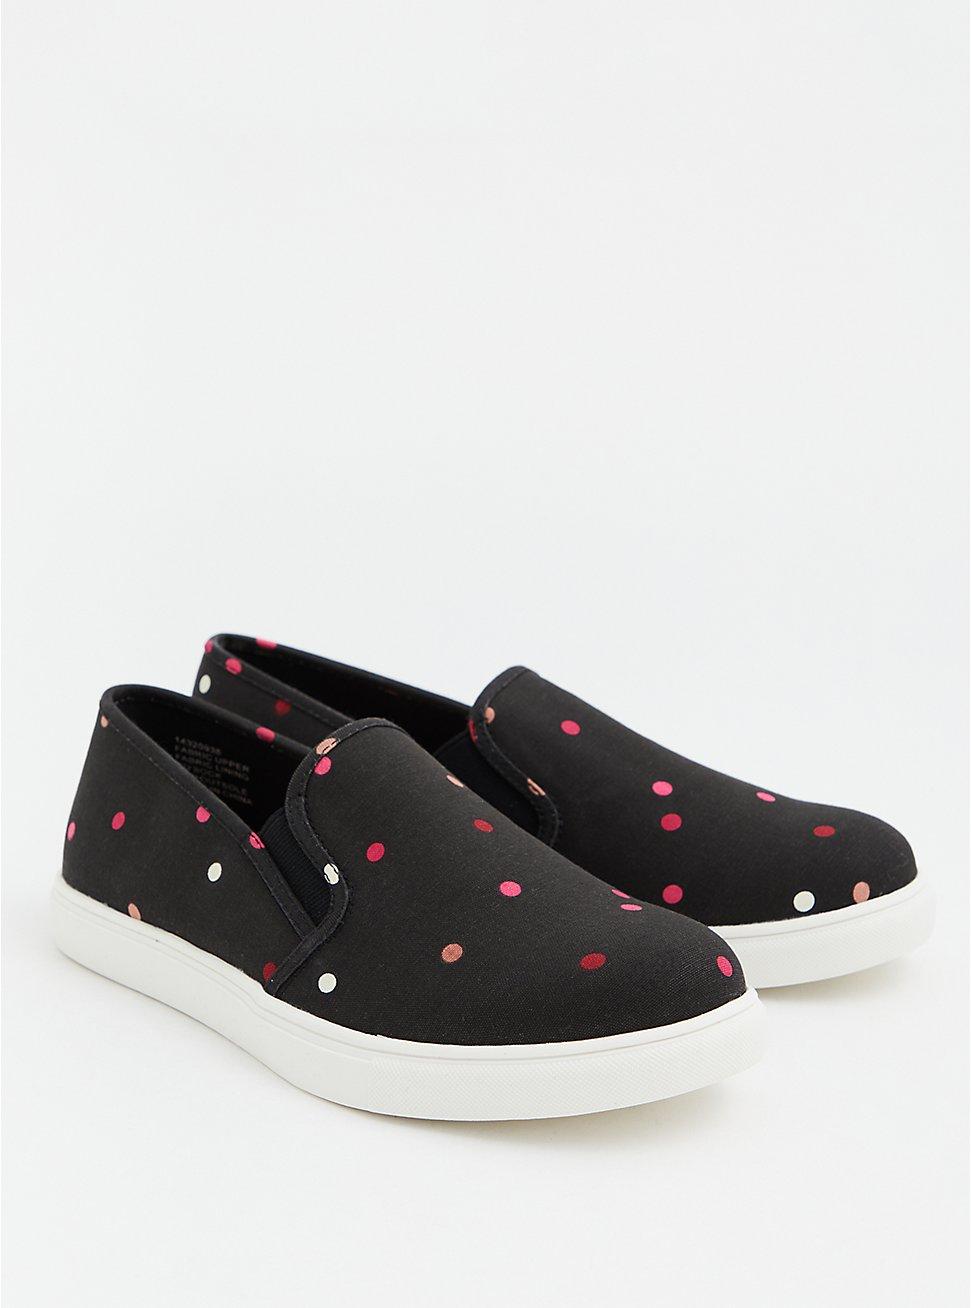 Black Polka Dot Canvas Slip-On Sneaker (WW), BLACK-WHITE DOT, hi-res